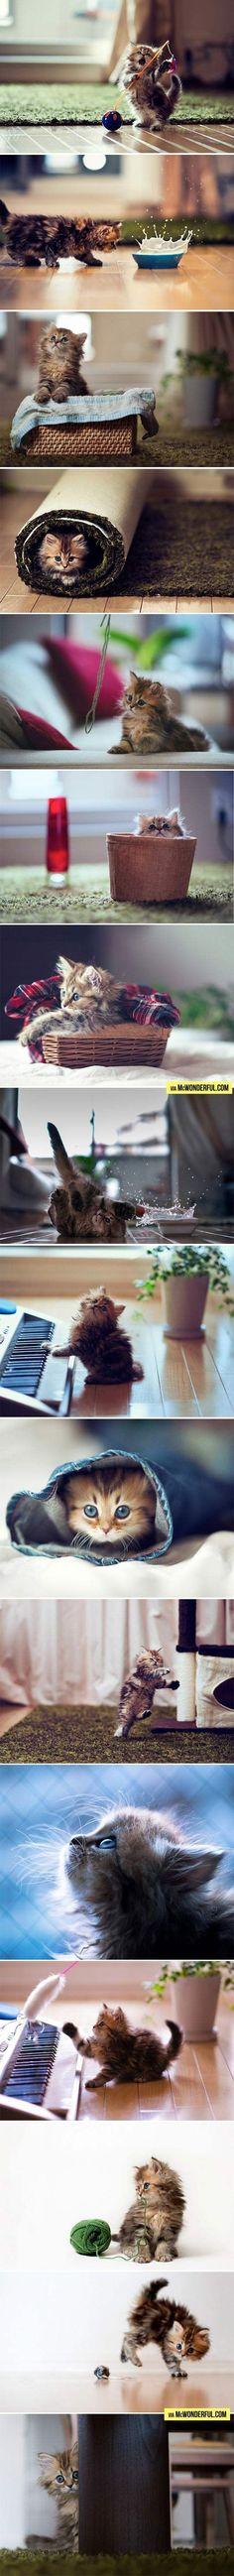 Adorable baby kitten doing kitten things. Melts my heart